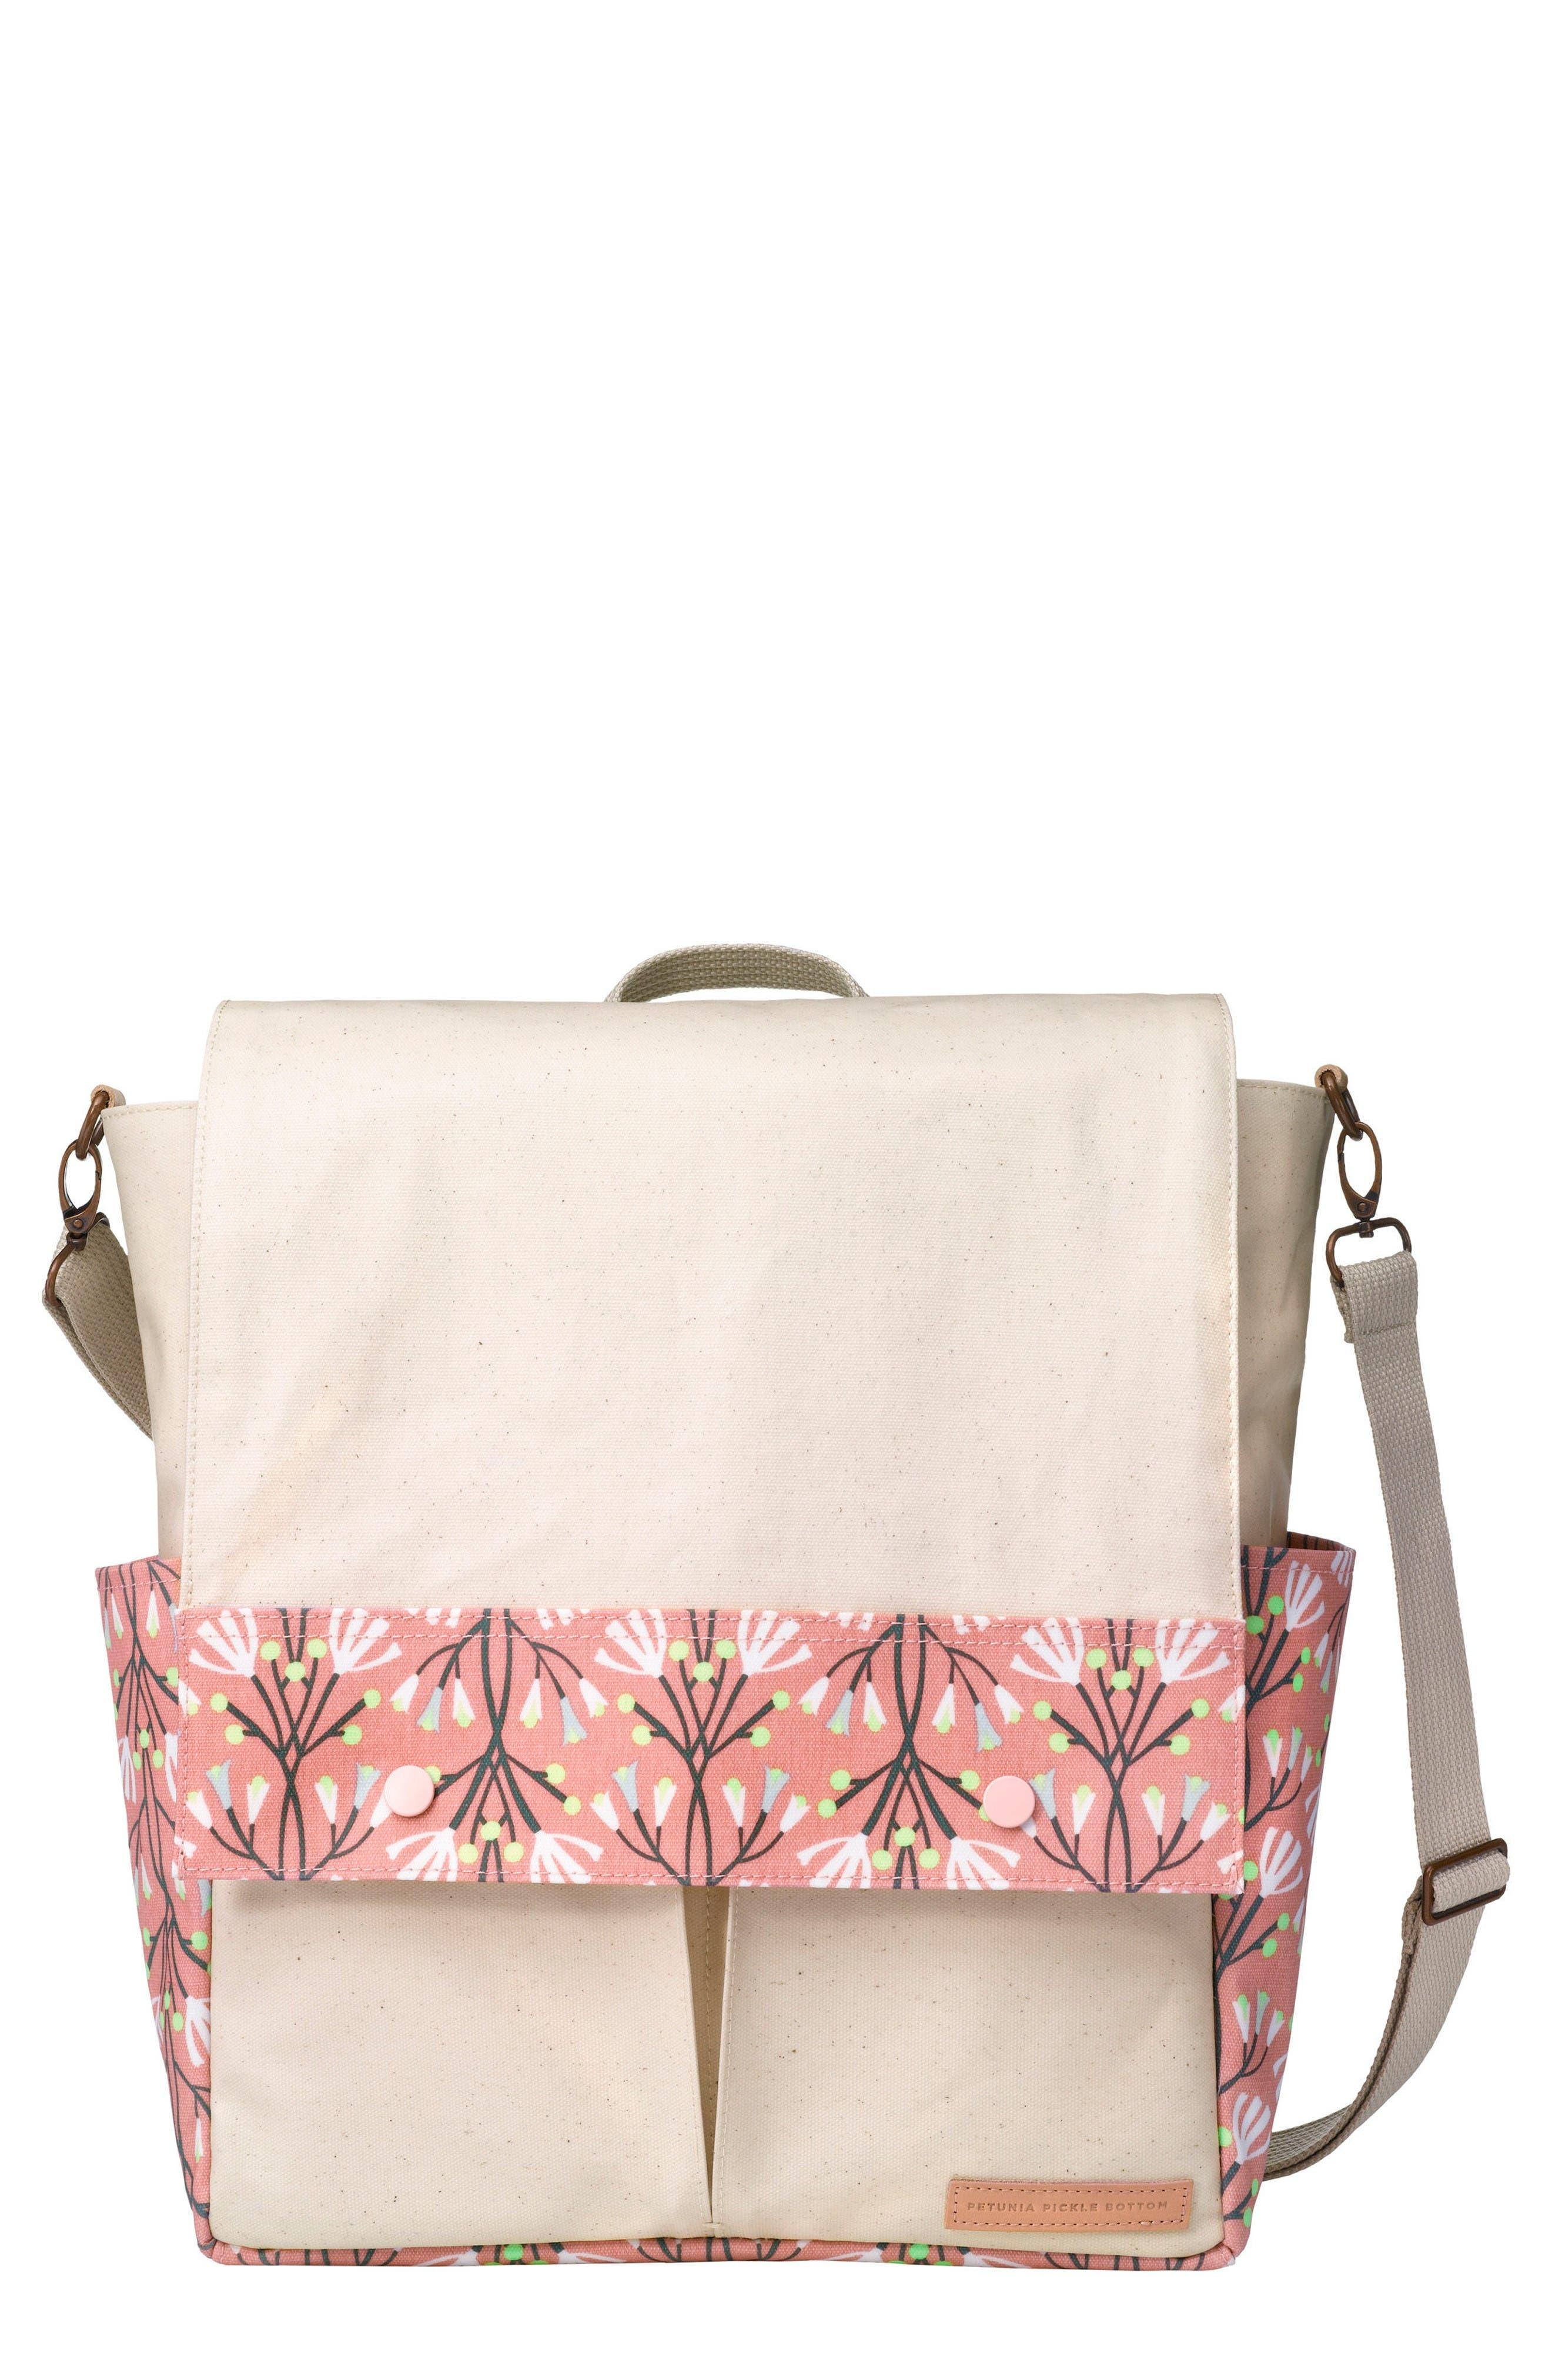 Main Image - Petunia Pickle Bottom Pathway Backpack Diaper Tote